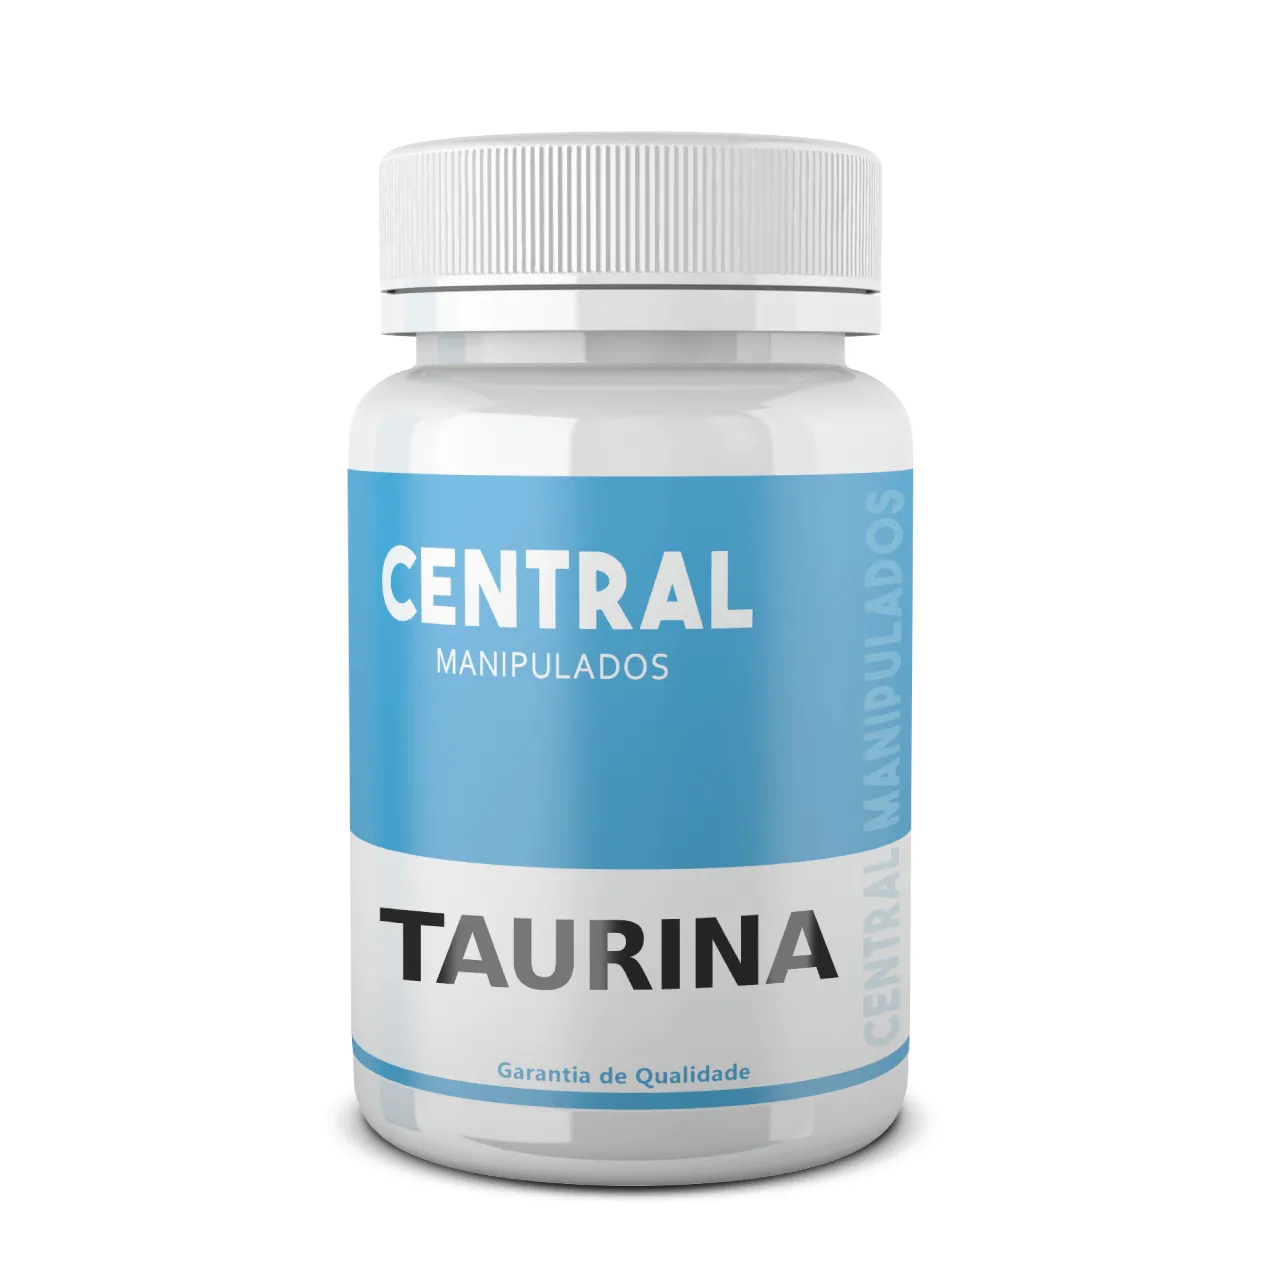 Taurina 500mg - 90 cápsulas - Energia, humor saudável, antioxidante, Protetor Cardiovascular